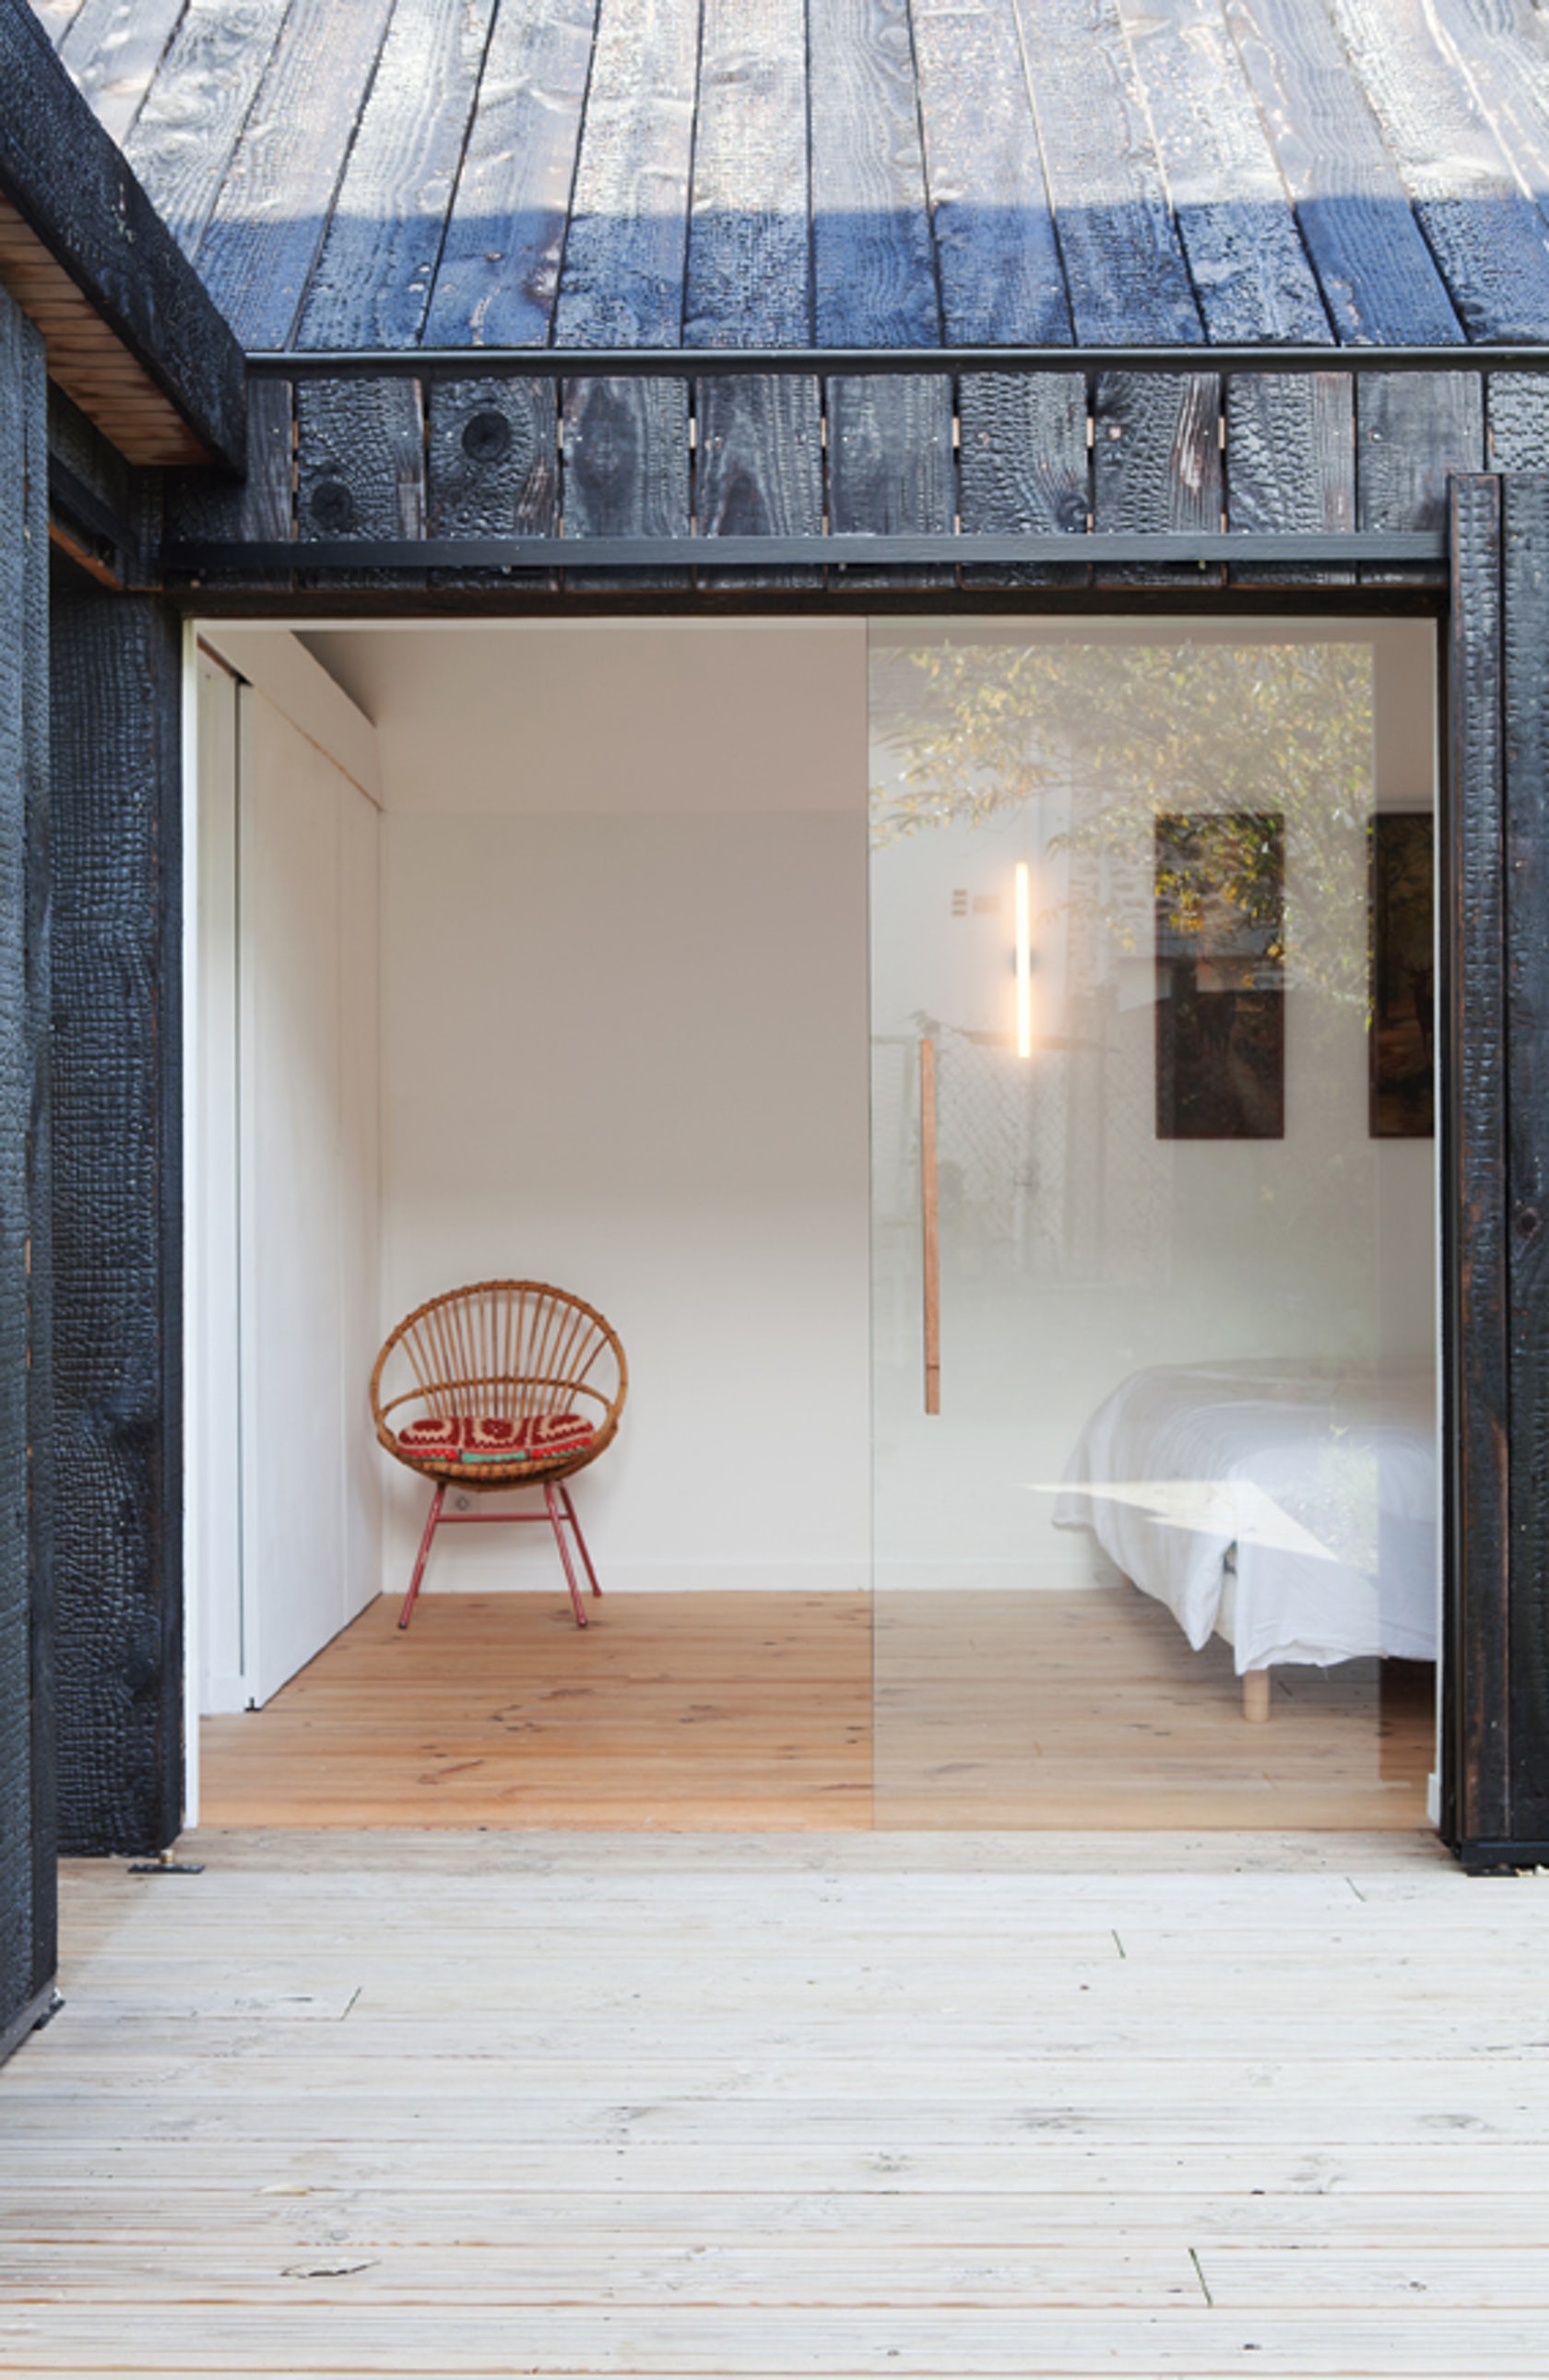 maison en bois br l ambon architizer. Black Bedroom Furniture Sets. Home Design Ideas